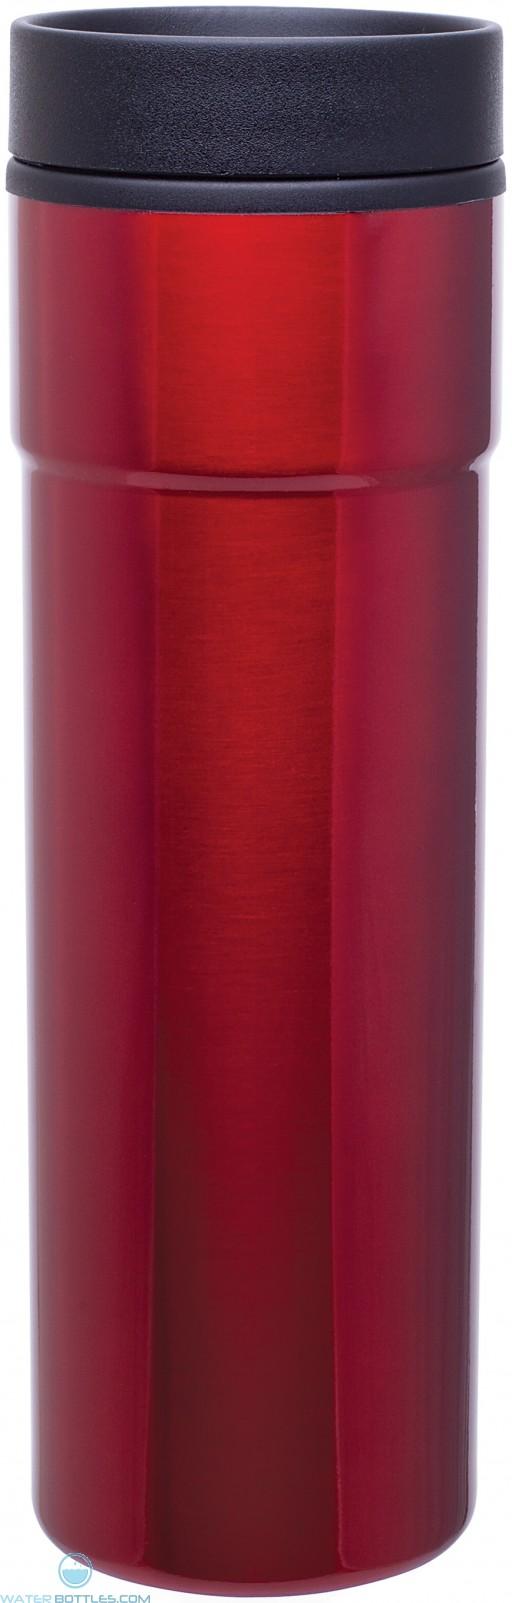 Foam Insulated Como Tumblers | 16 oz - Red